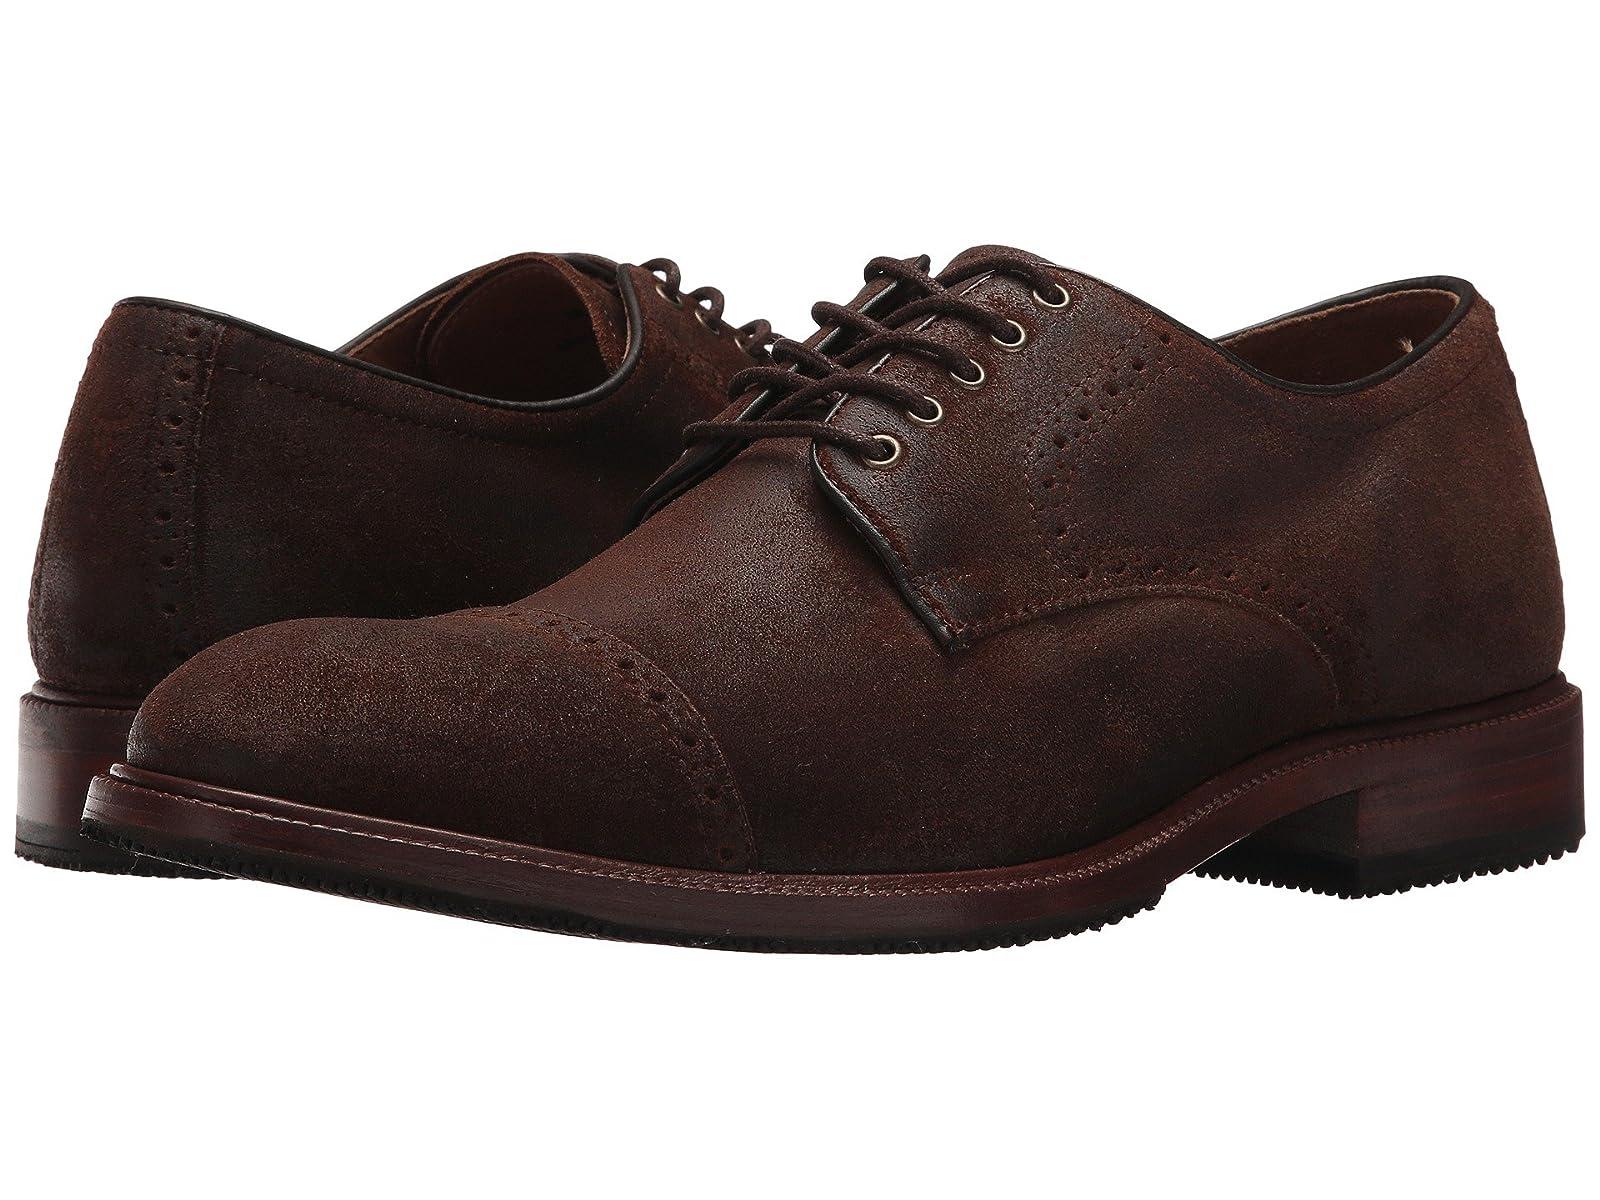 Trask LinwoodAtmospheric grades have affordable shoes